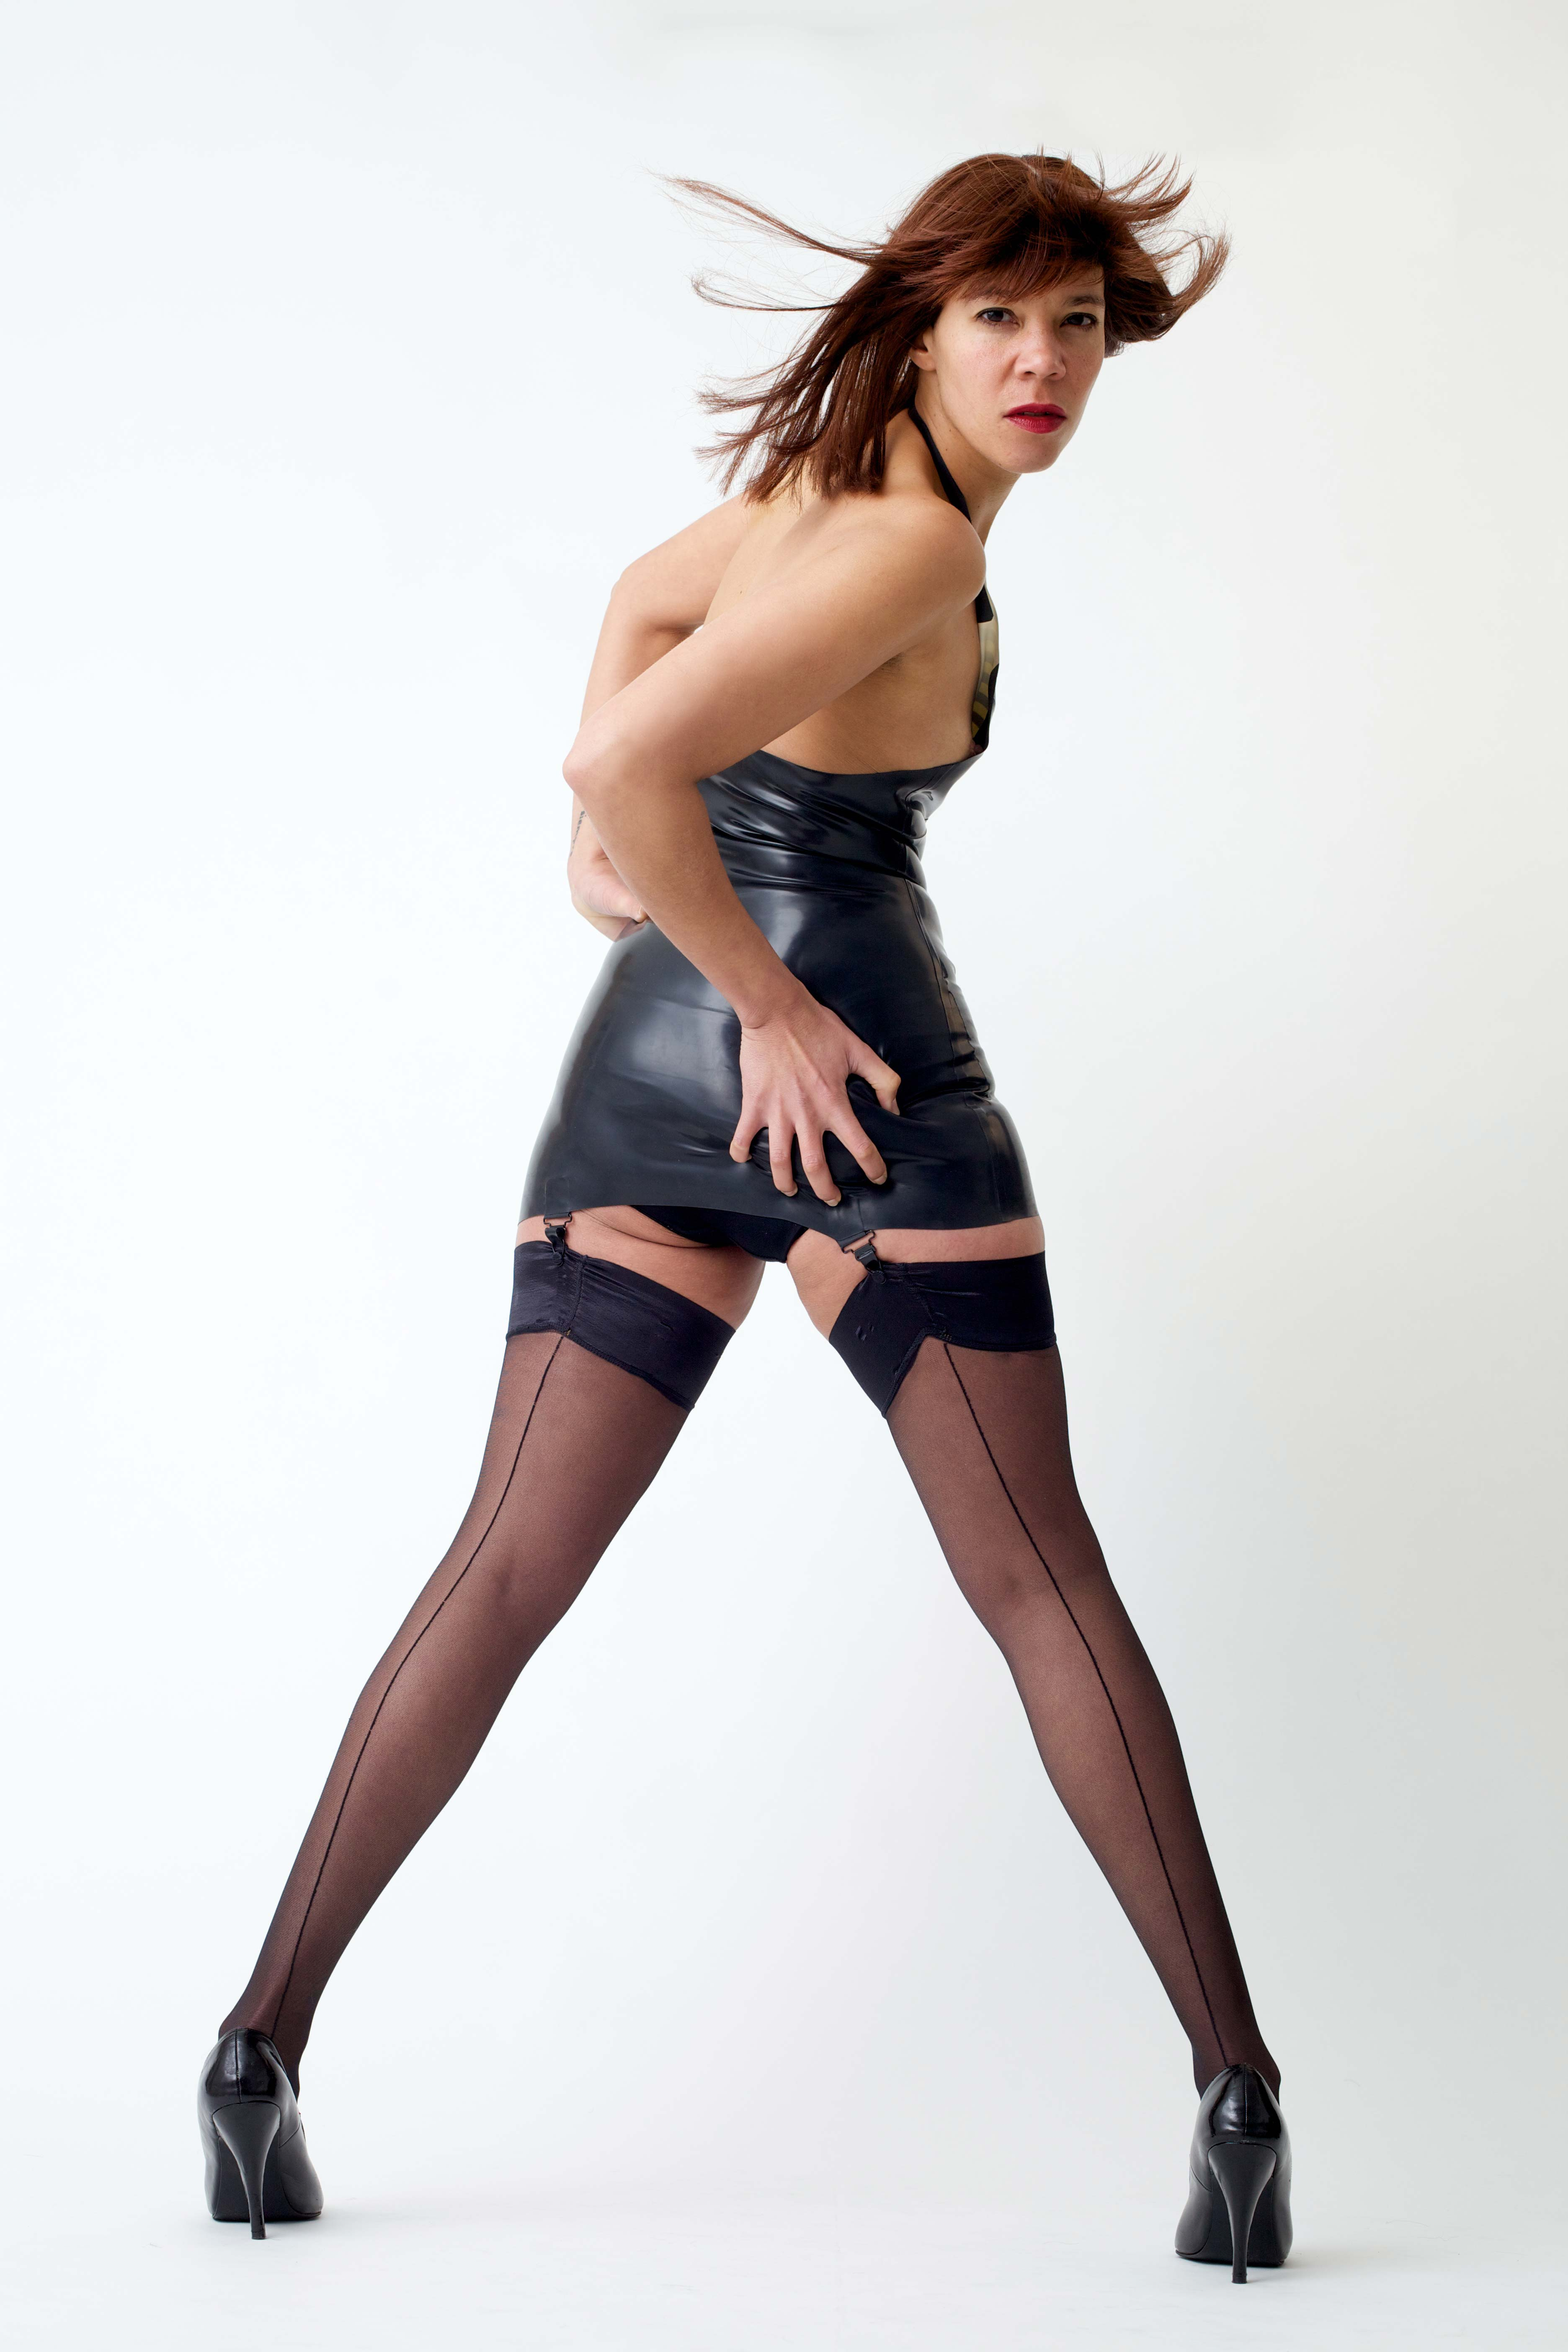 best-london-femdom-caning-bondage-spanking-pain-mistress-kings-cross